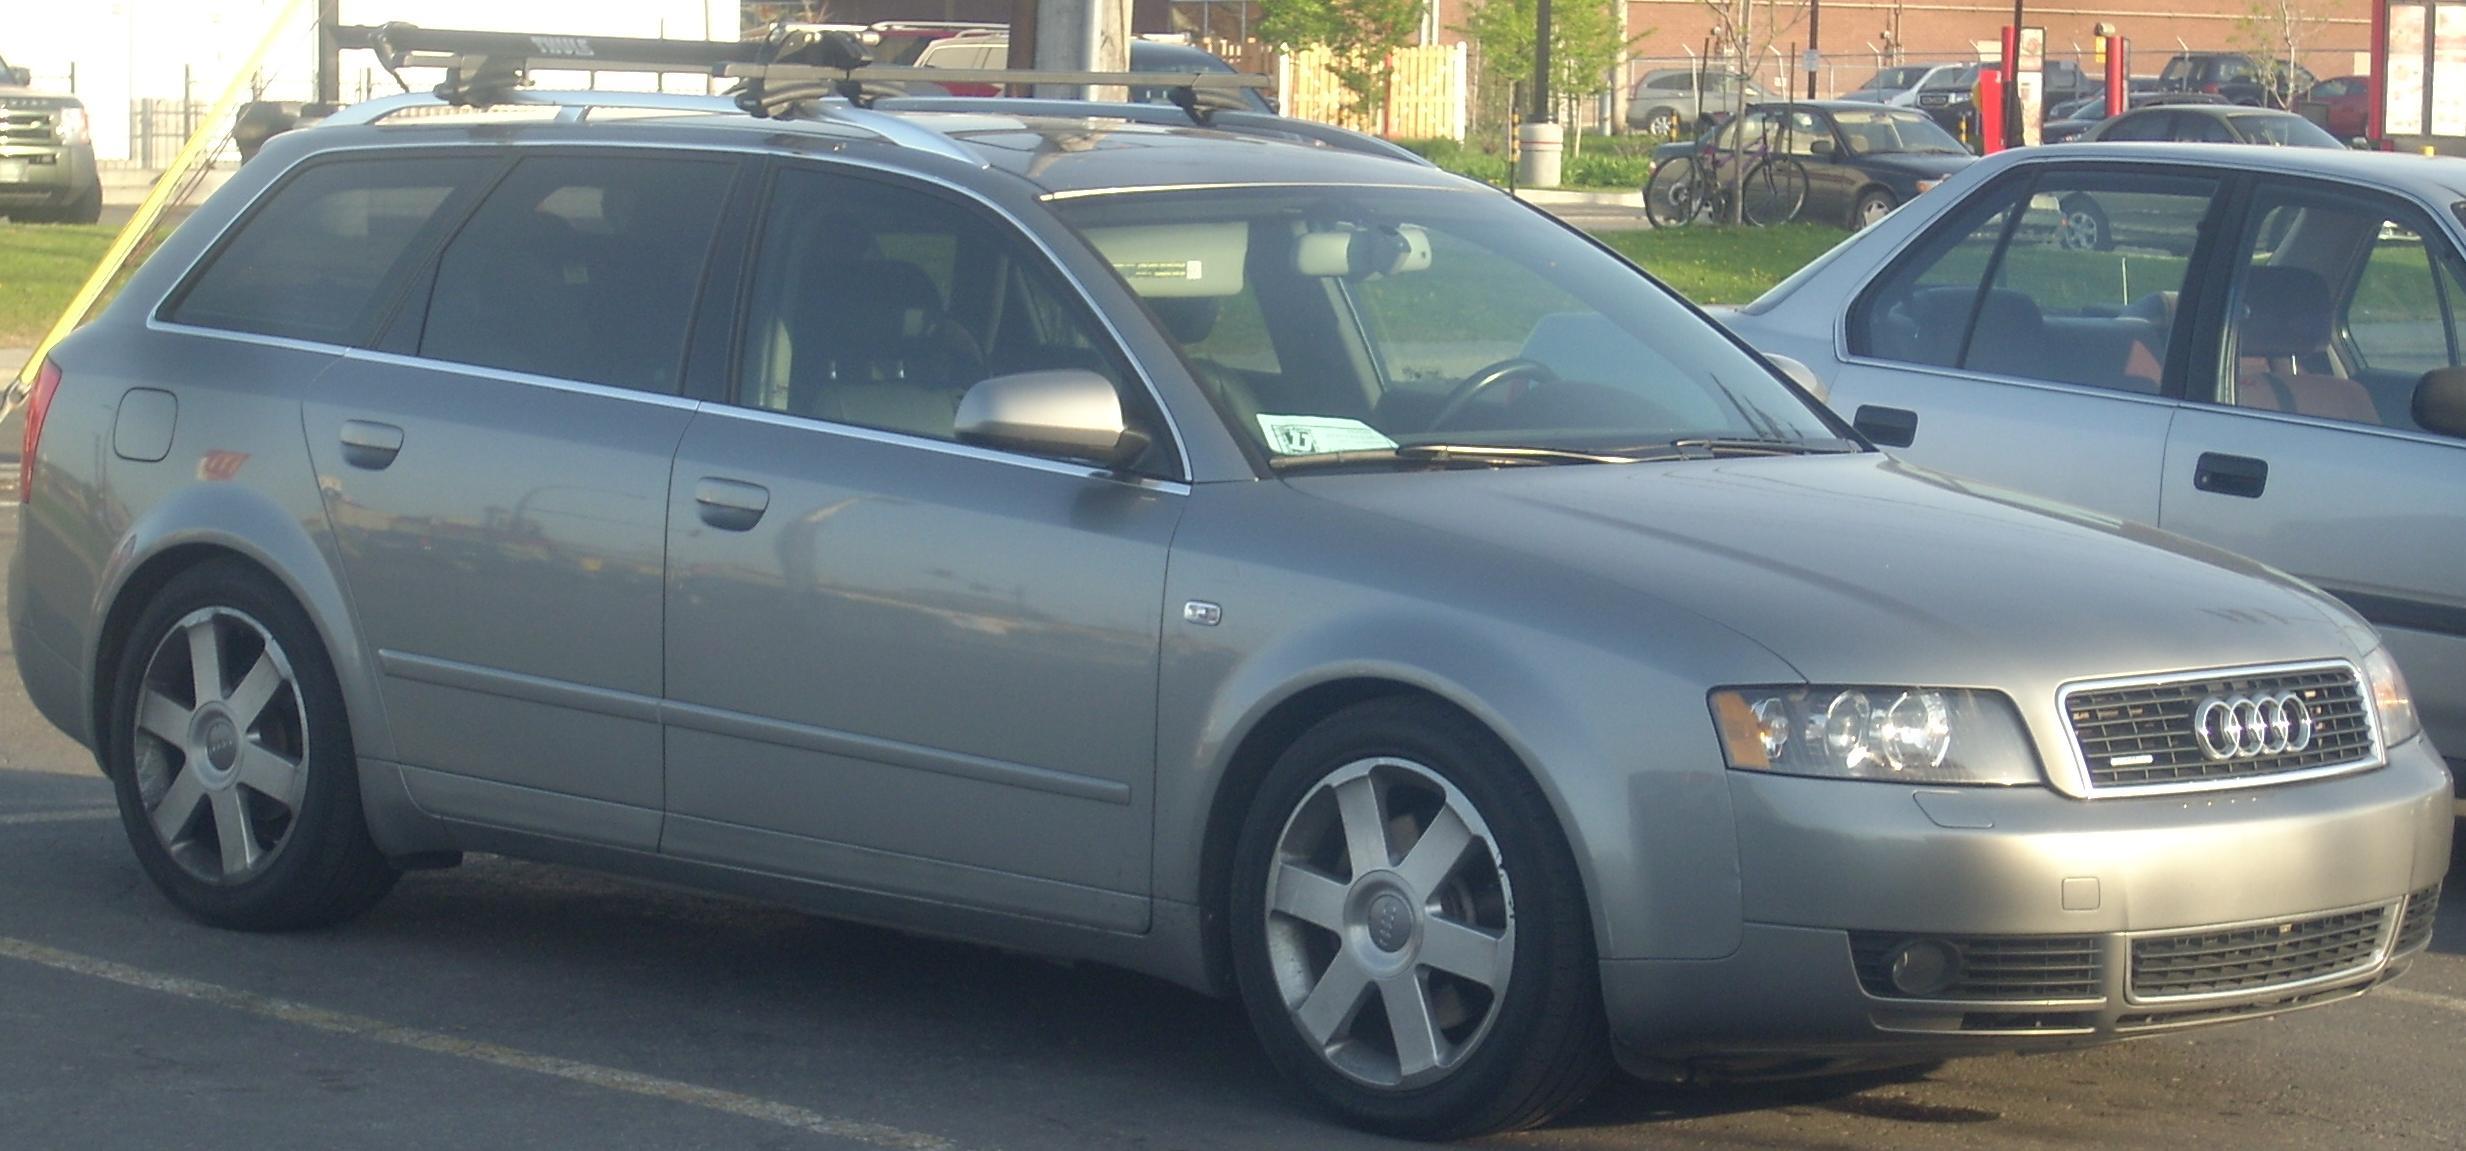 File:'02-'05 Audi A4 Avant 3.0 Front (Orange Julep).jpg - Wikimedia